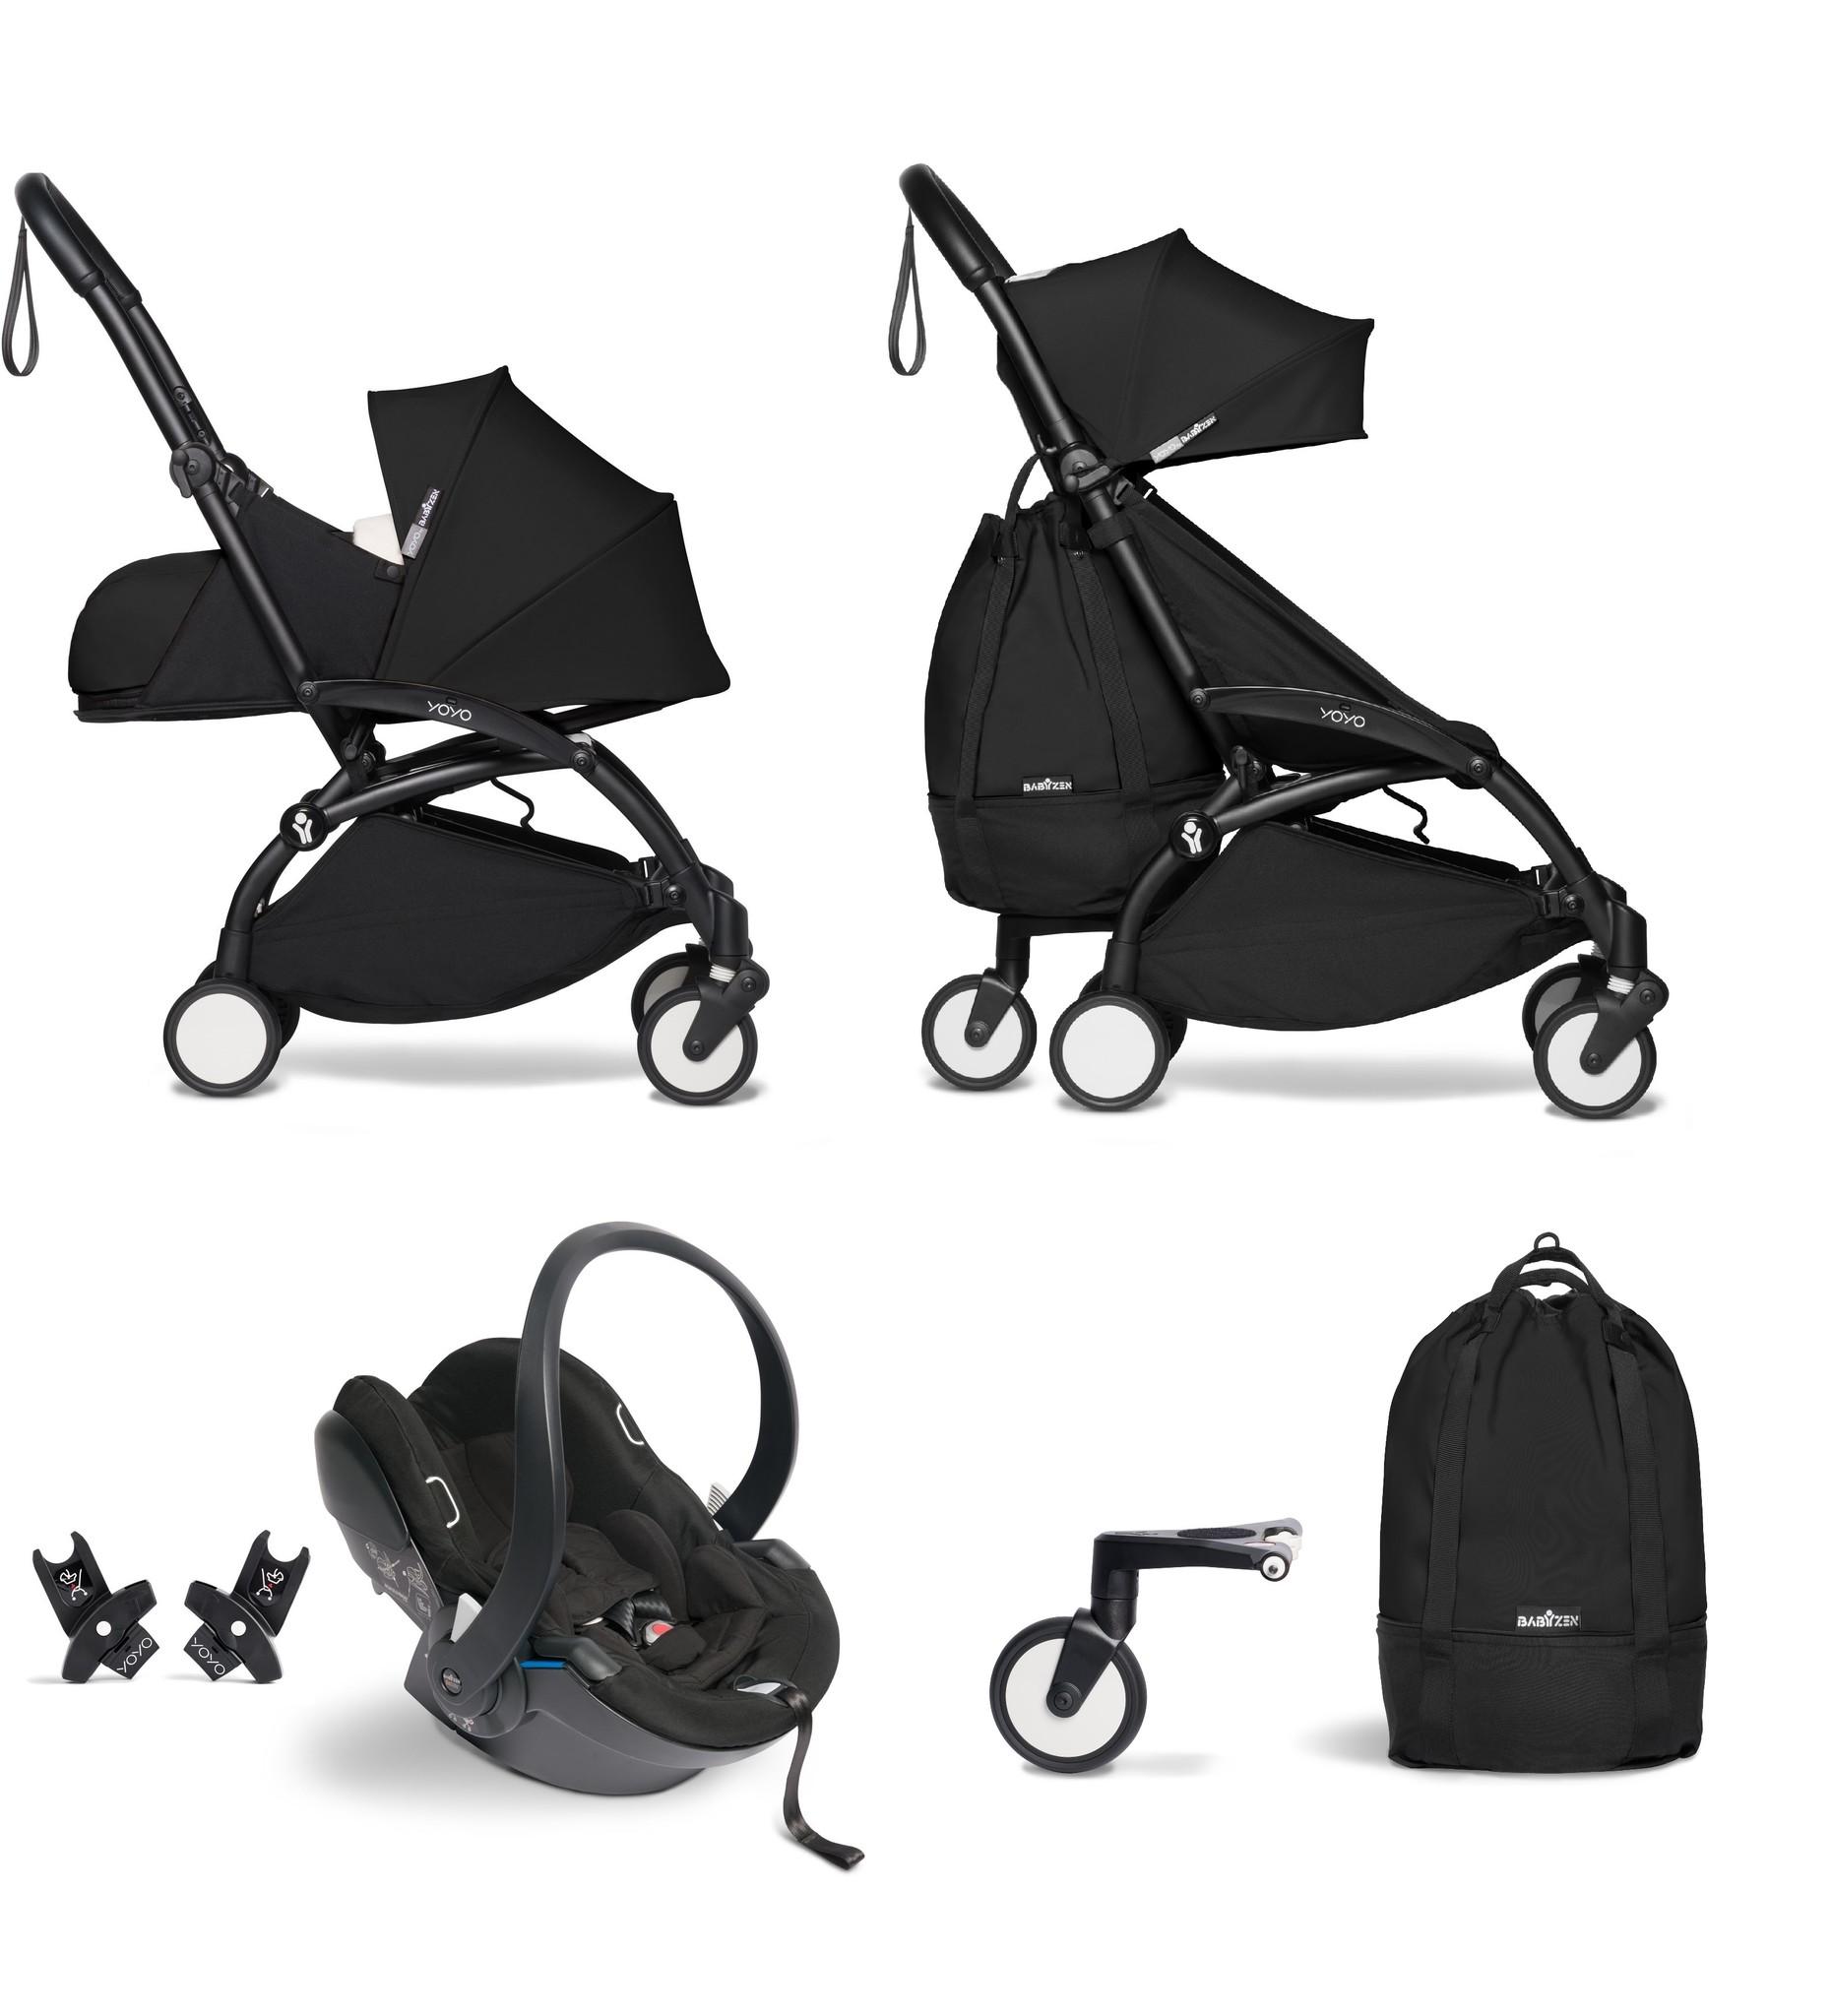 Babyzen YOYO² buggy COMPLEET vanaf de geboorte inclusief YOYO² BeSafe autostoel zwart en YOYO Bag -